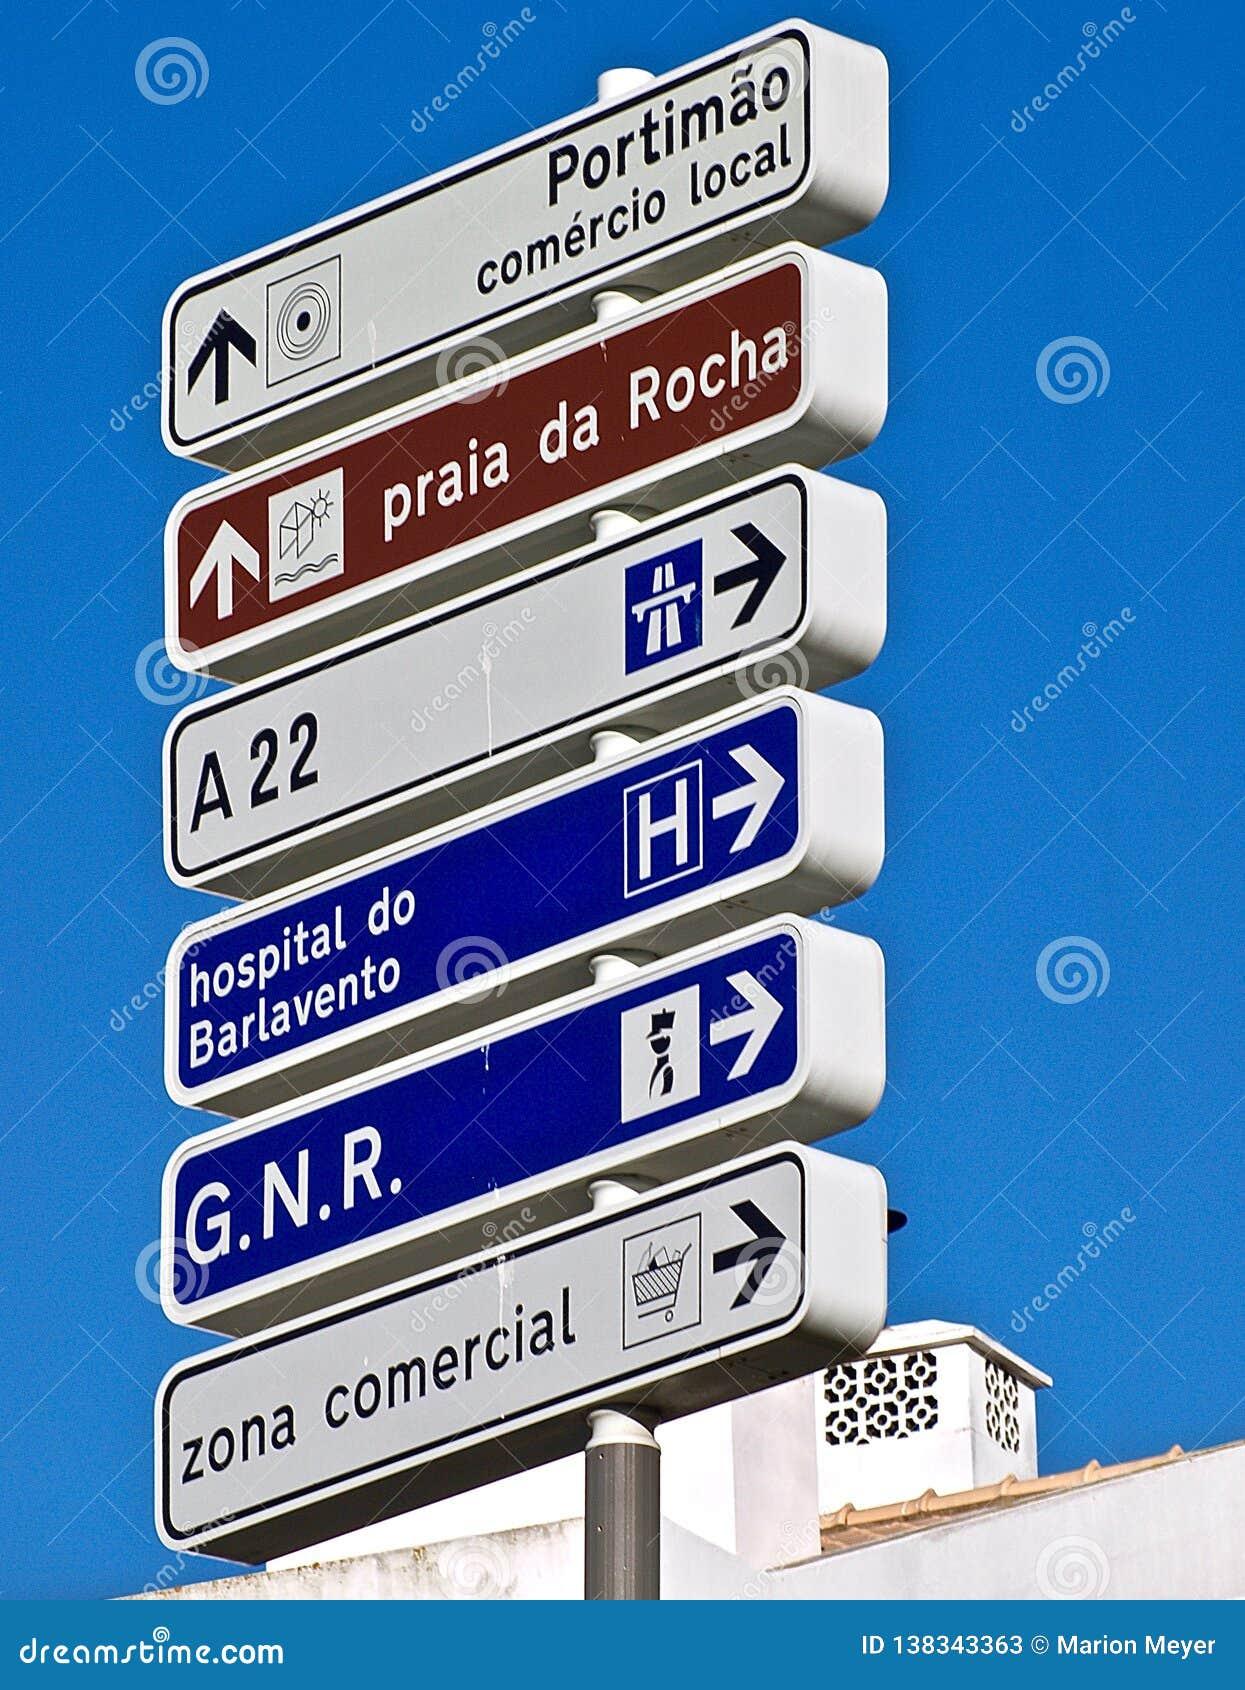 Street signs in Portimao in Portugal